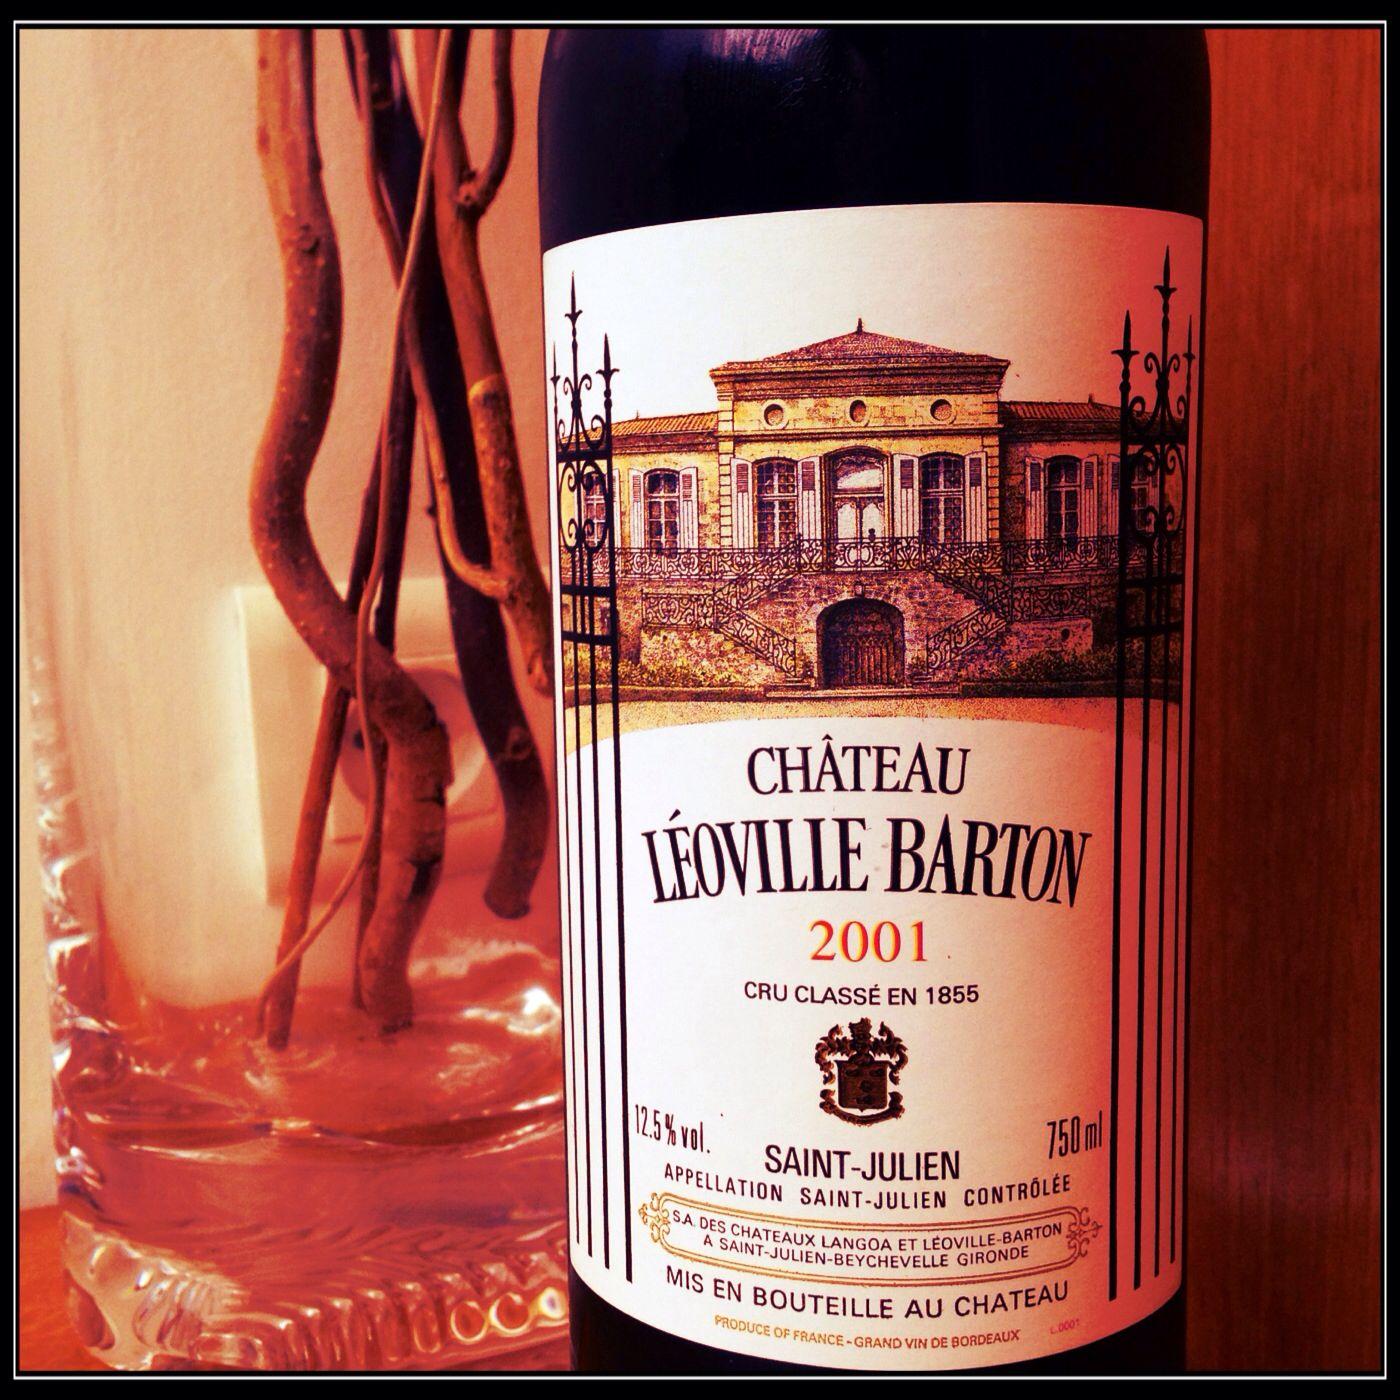 Chateau Leoville Barton 2001 Grand Cru Classe De Saint Julien Bouteille Sainte Julienne Gironde